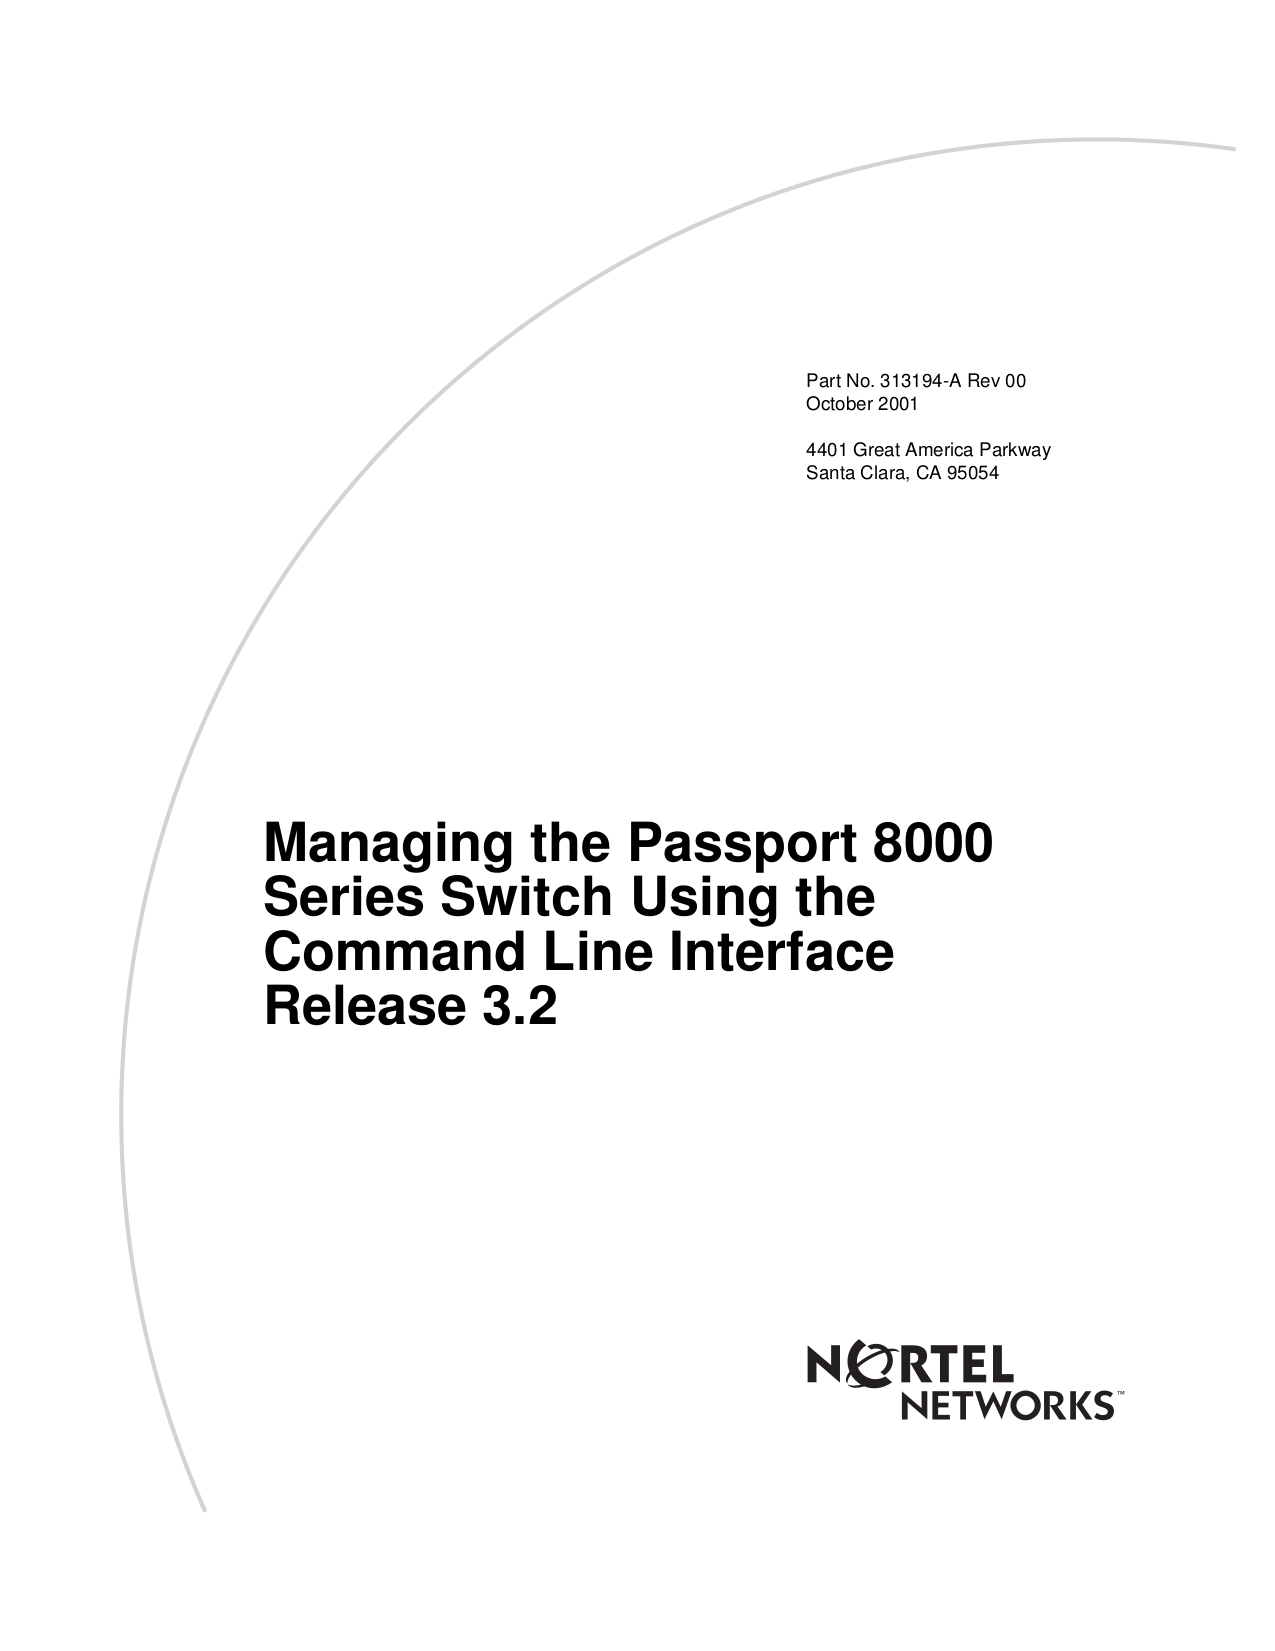 pdf for Nortel Switch Passport 8010 manual